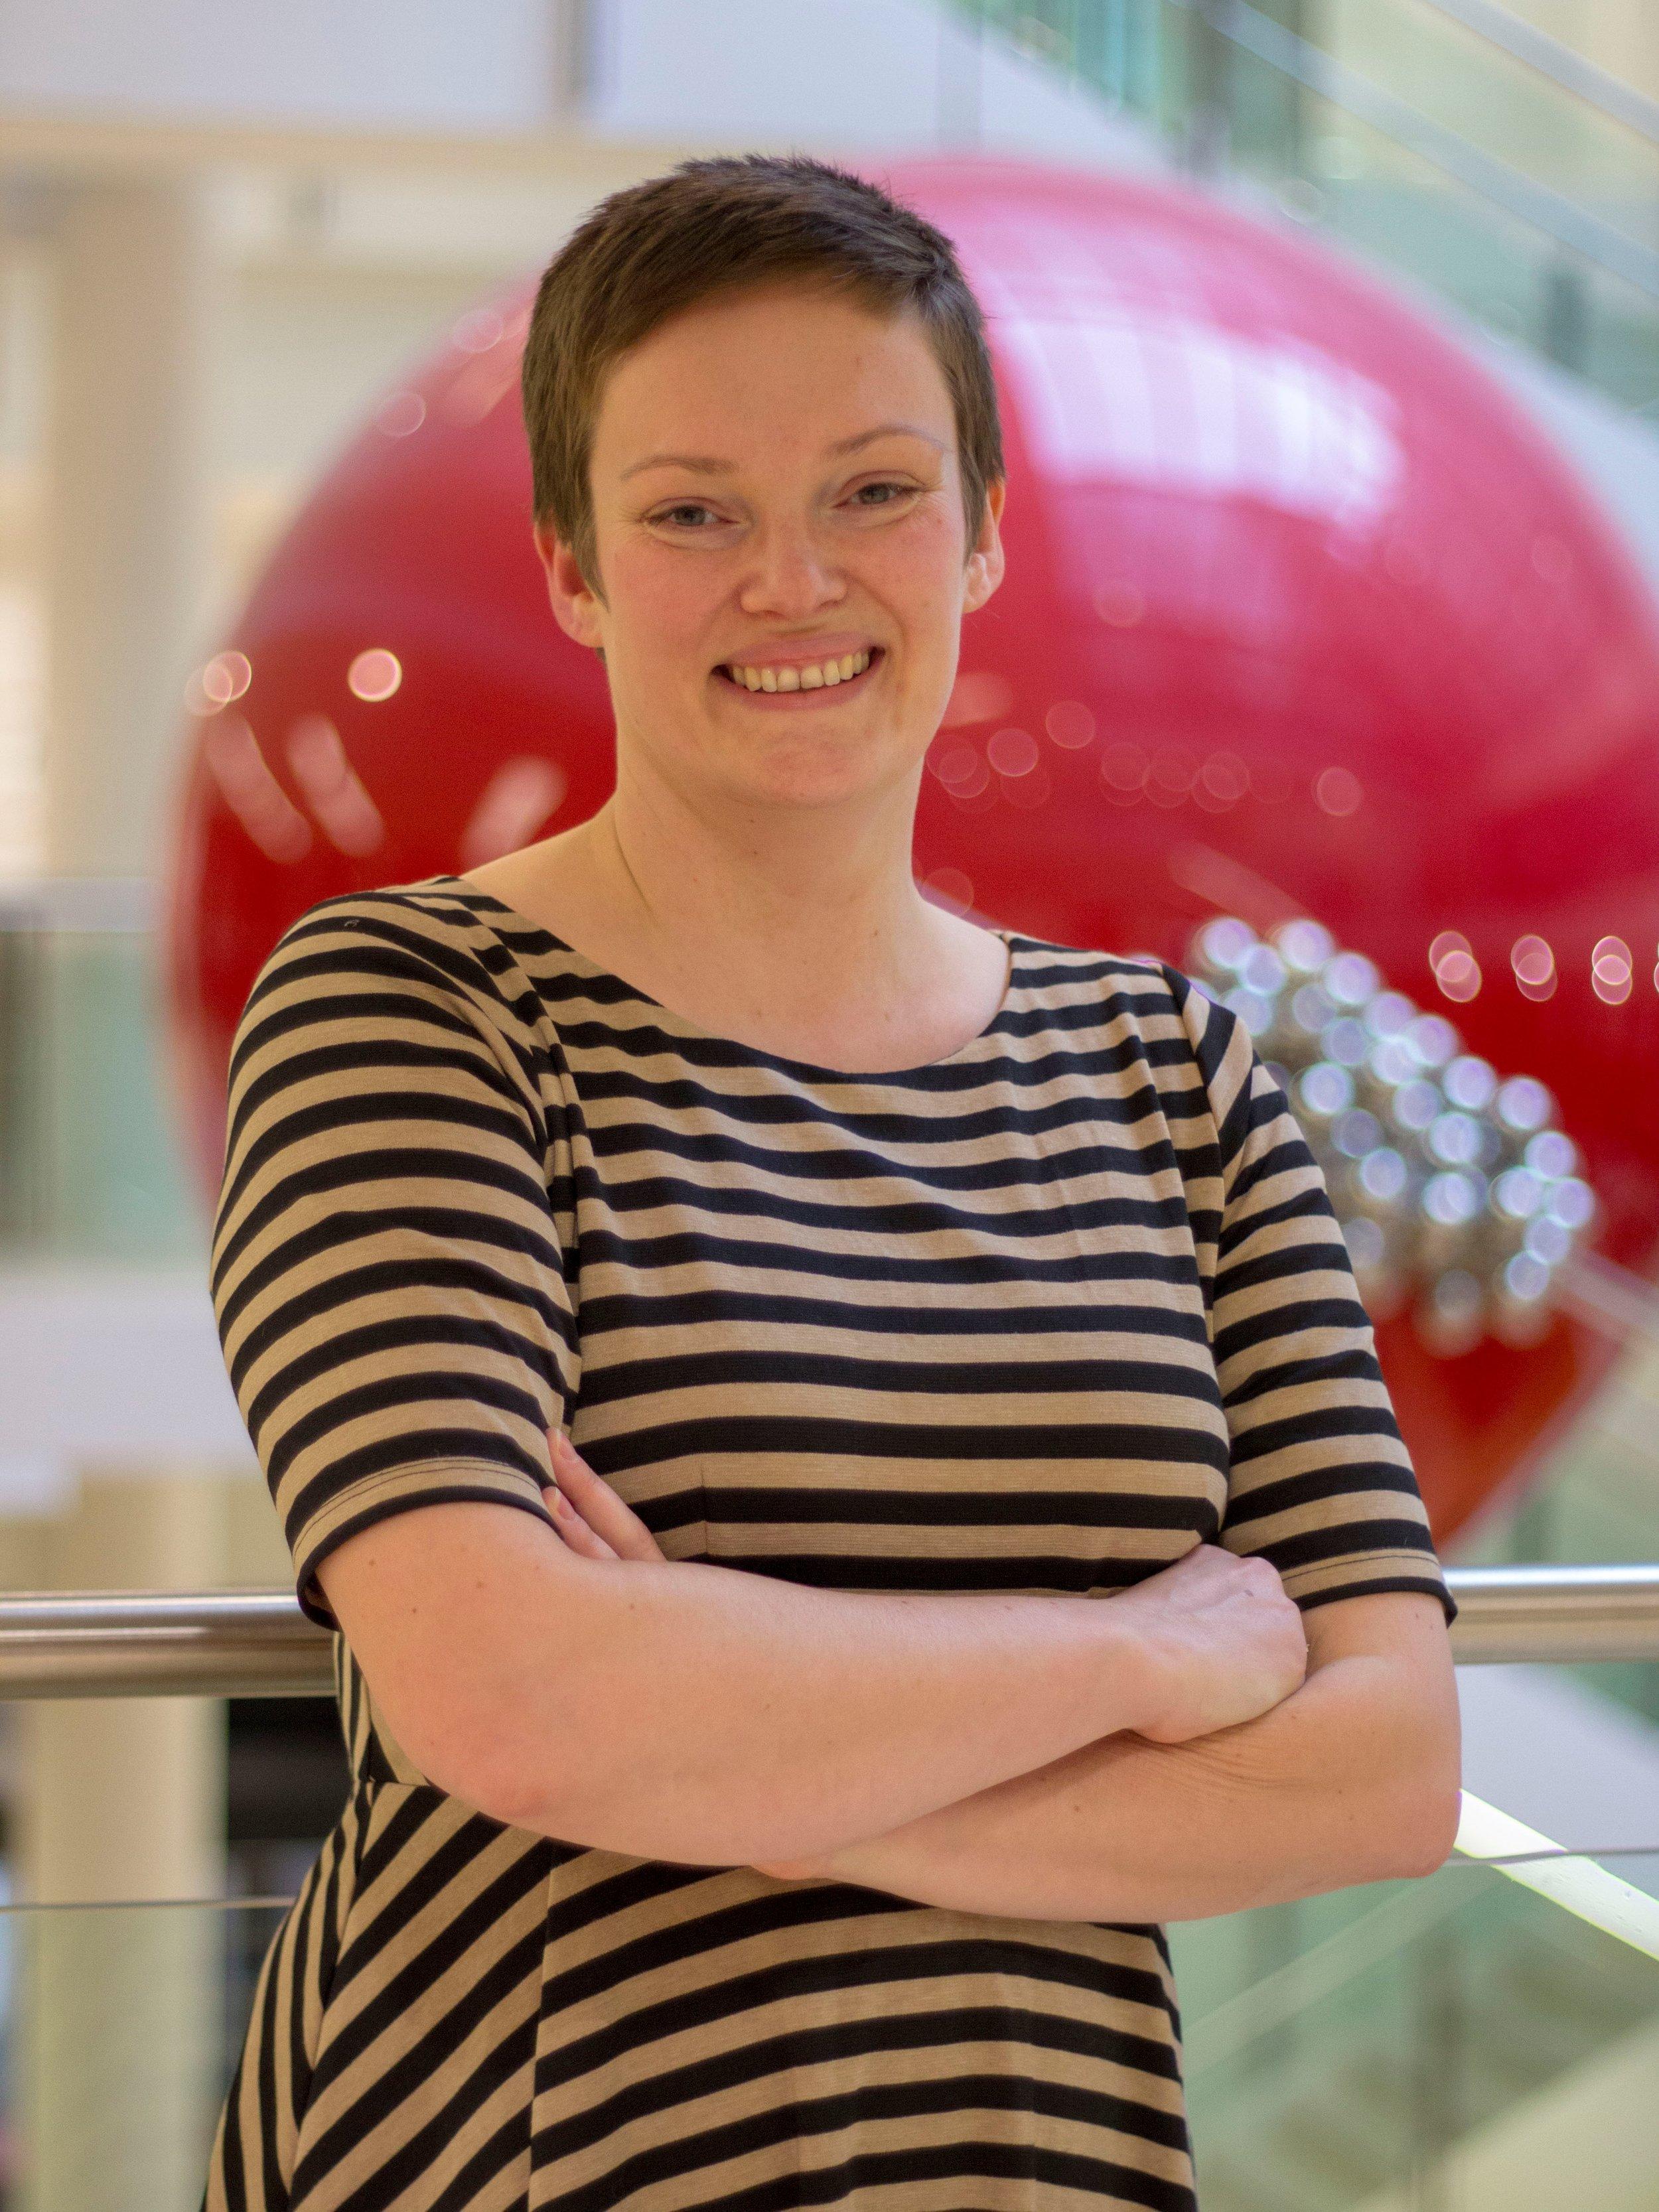 Louise Russell-Prywata - Living in: Gillingham, UKNationality: BritishTwitter: @_LouiseRP